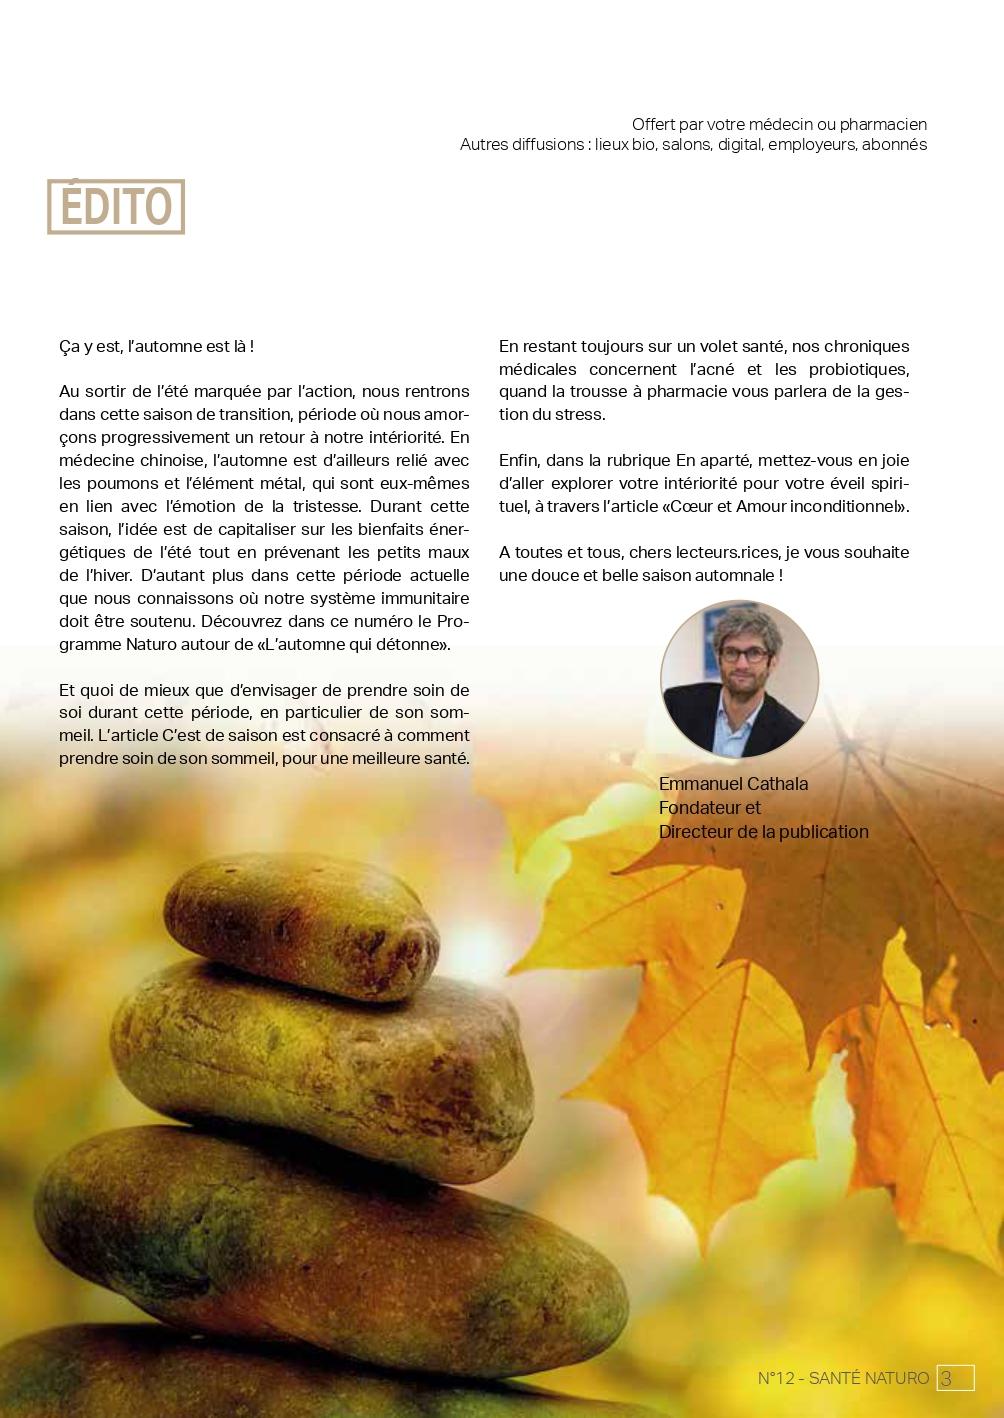 edito-sante-naturo-12-sante-naturelle-integrative--et-medecine-douce-naturopathie